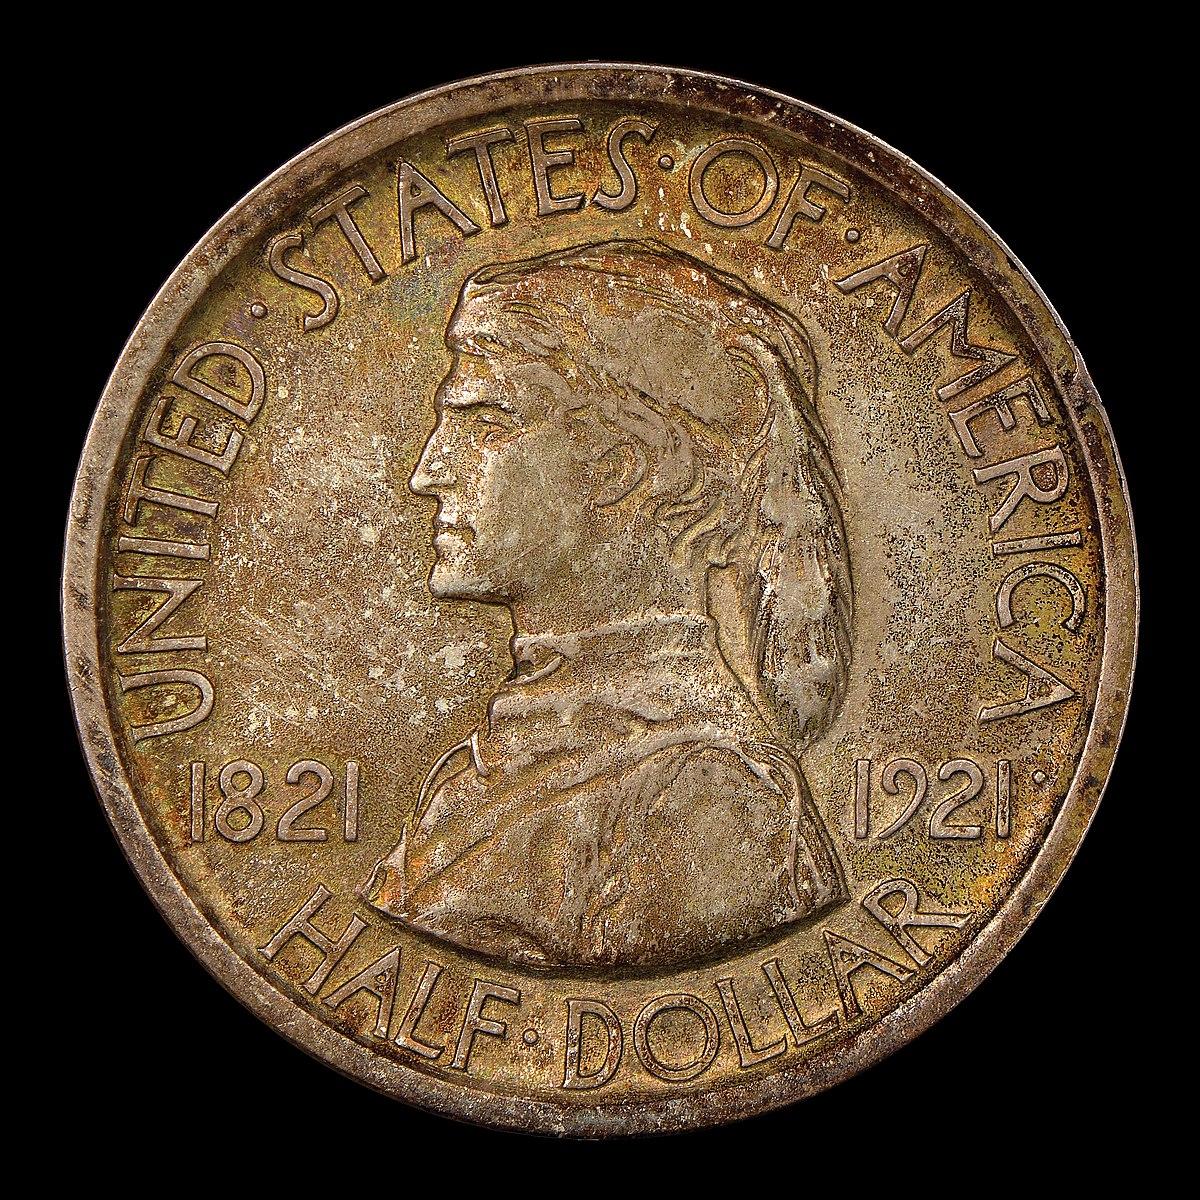 Missouri Centennial Half Dollar Wikipedia